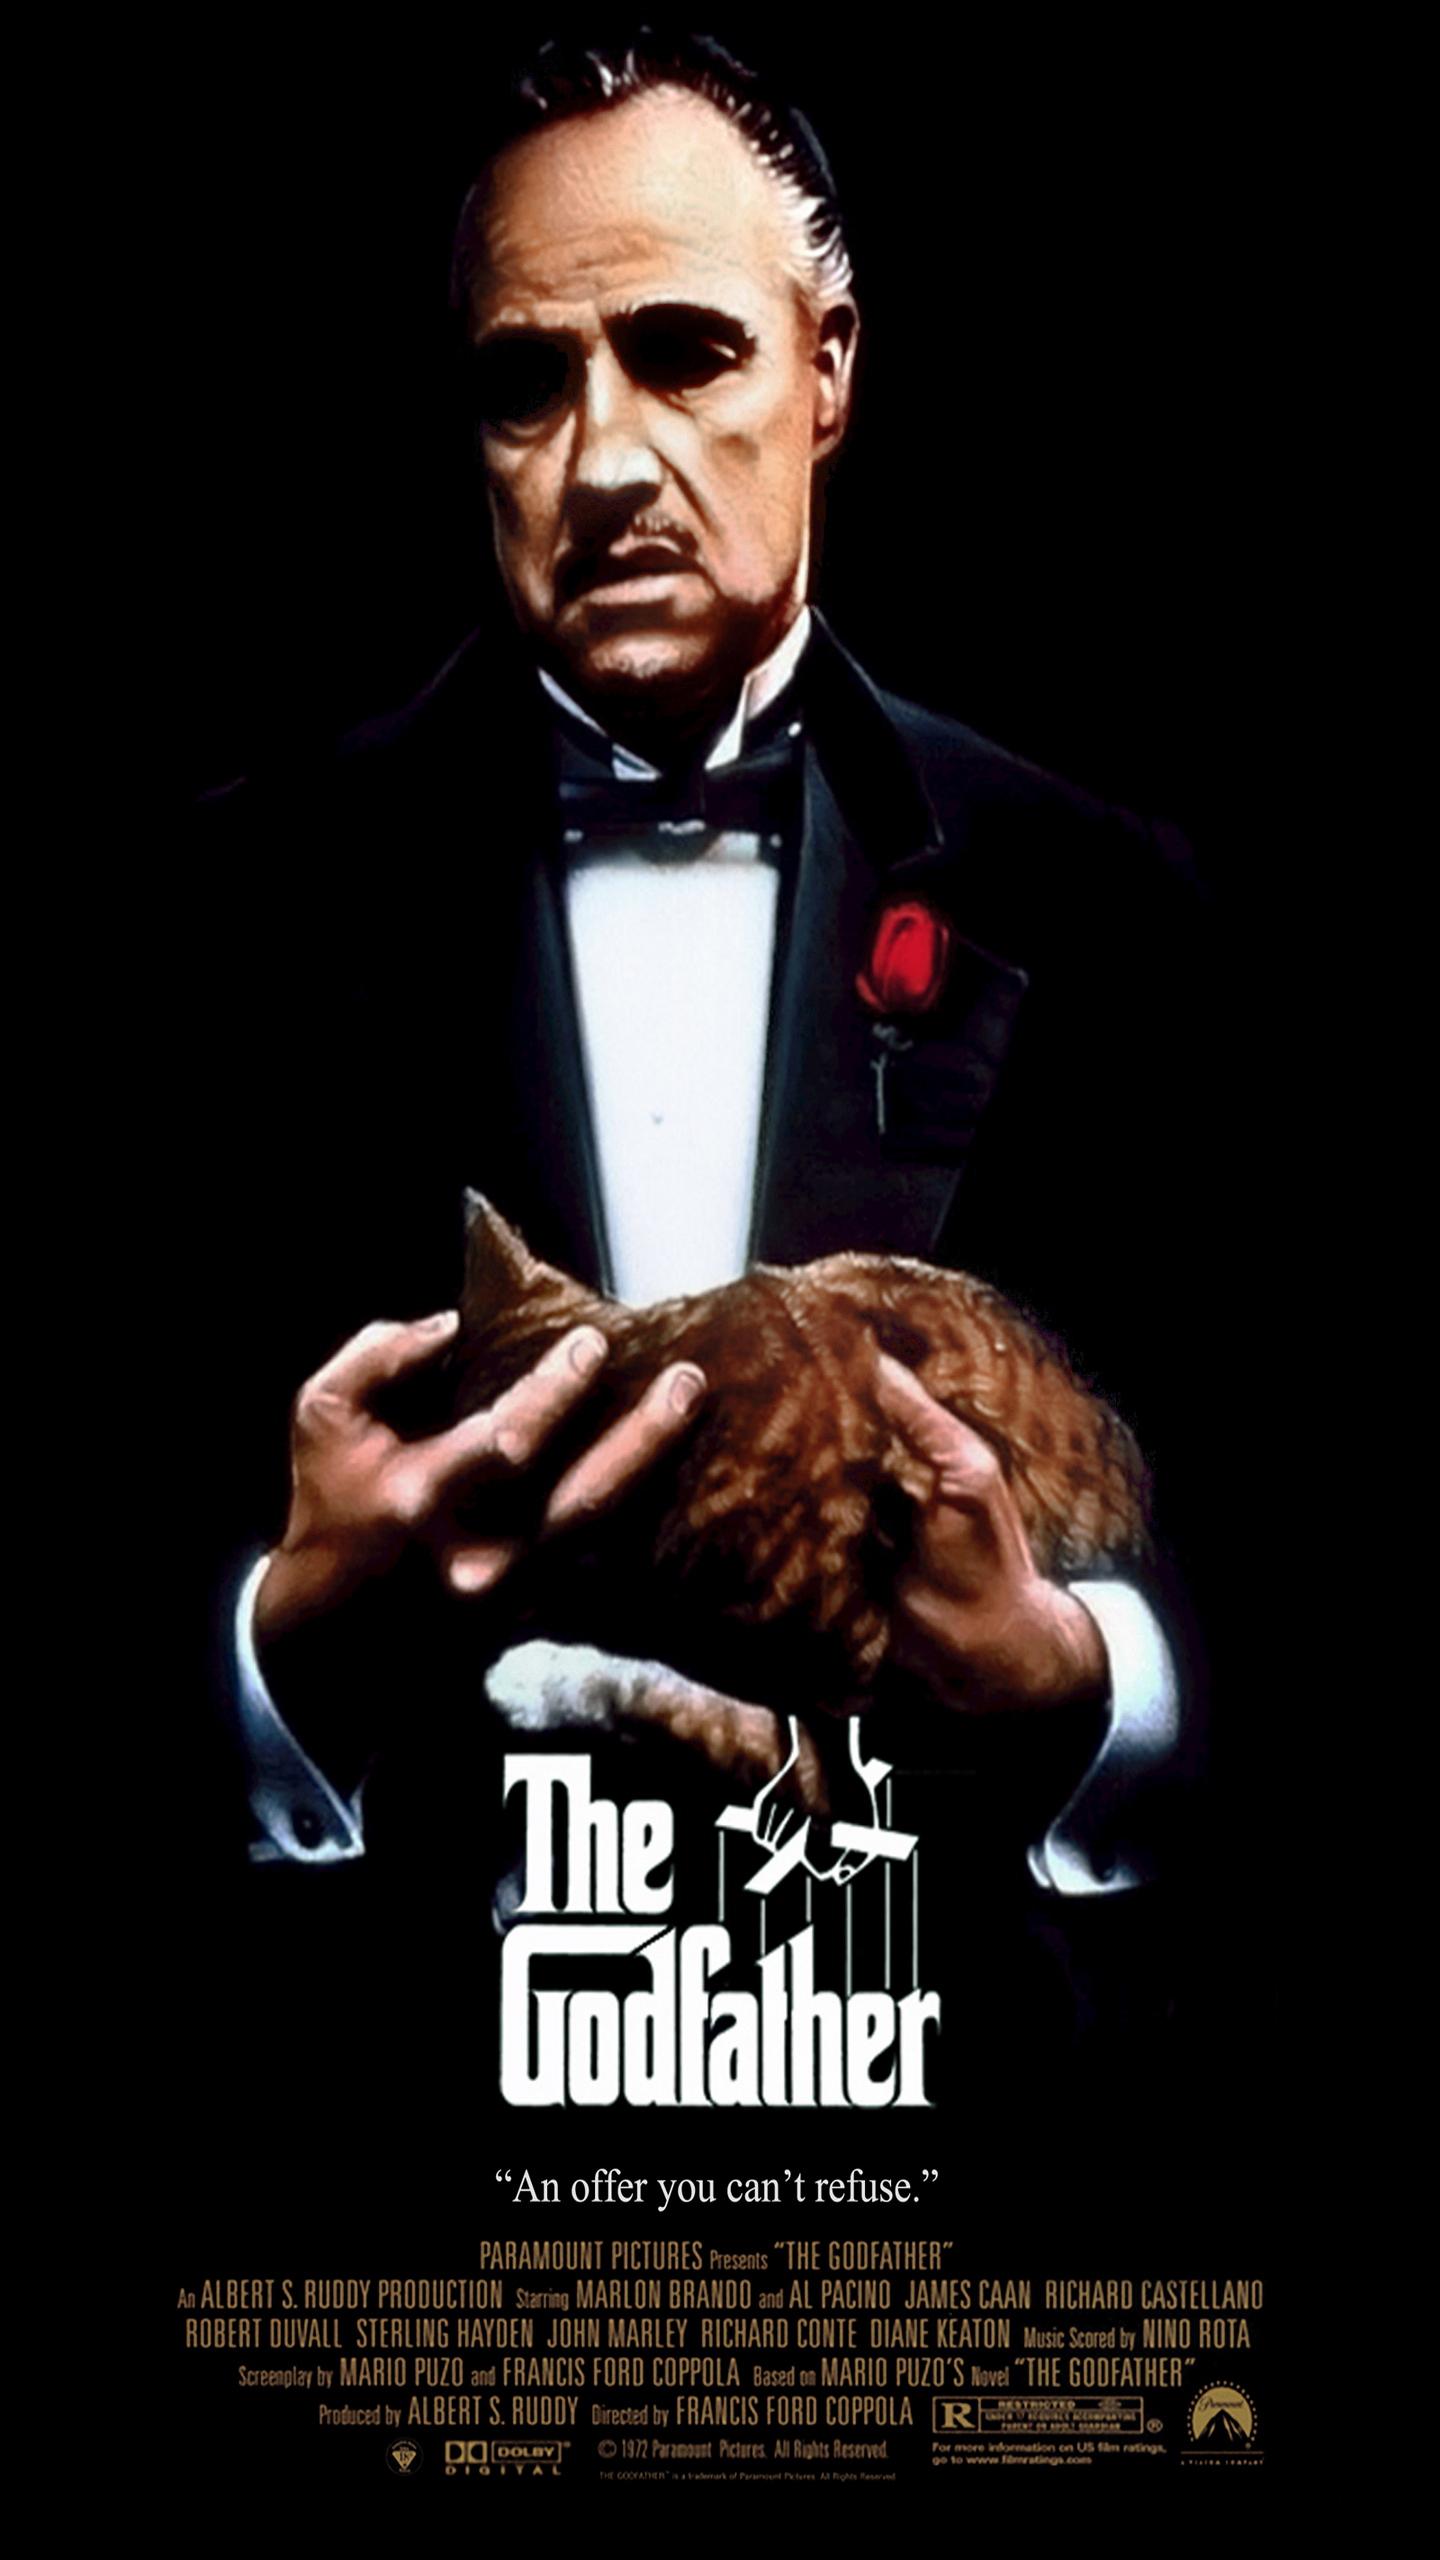 The Godfather HD Wallpaper - WallpaperSafari